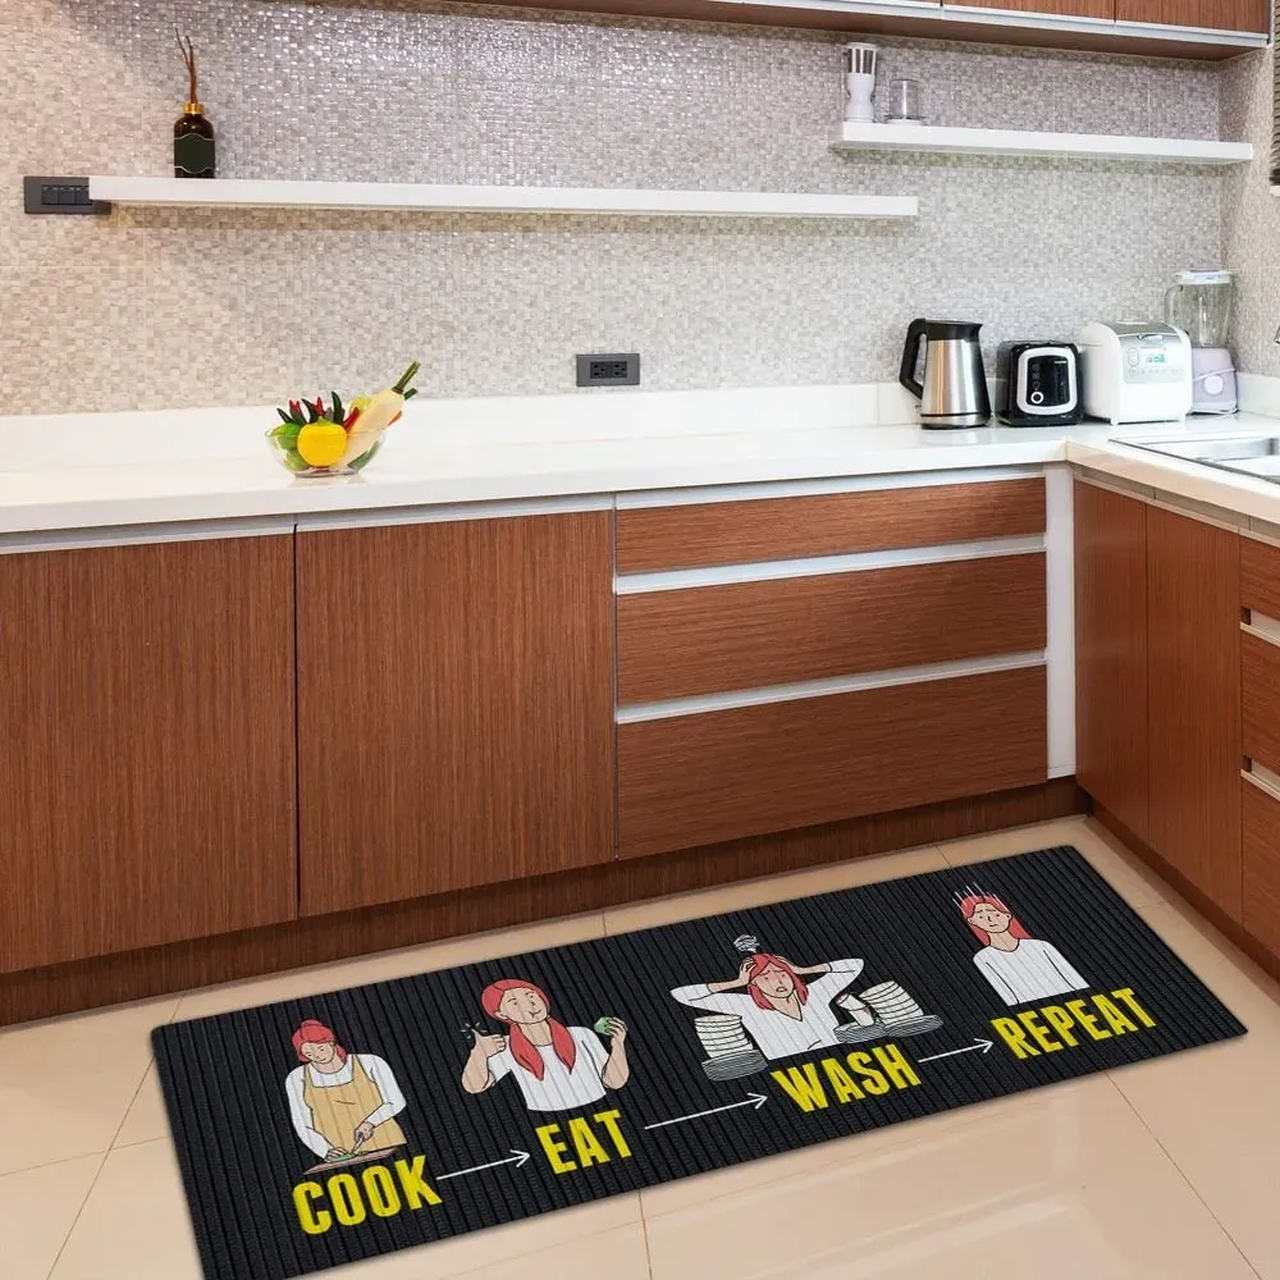 Tapete Cozinha Todo Dia Igual 125x40 cm